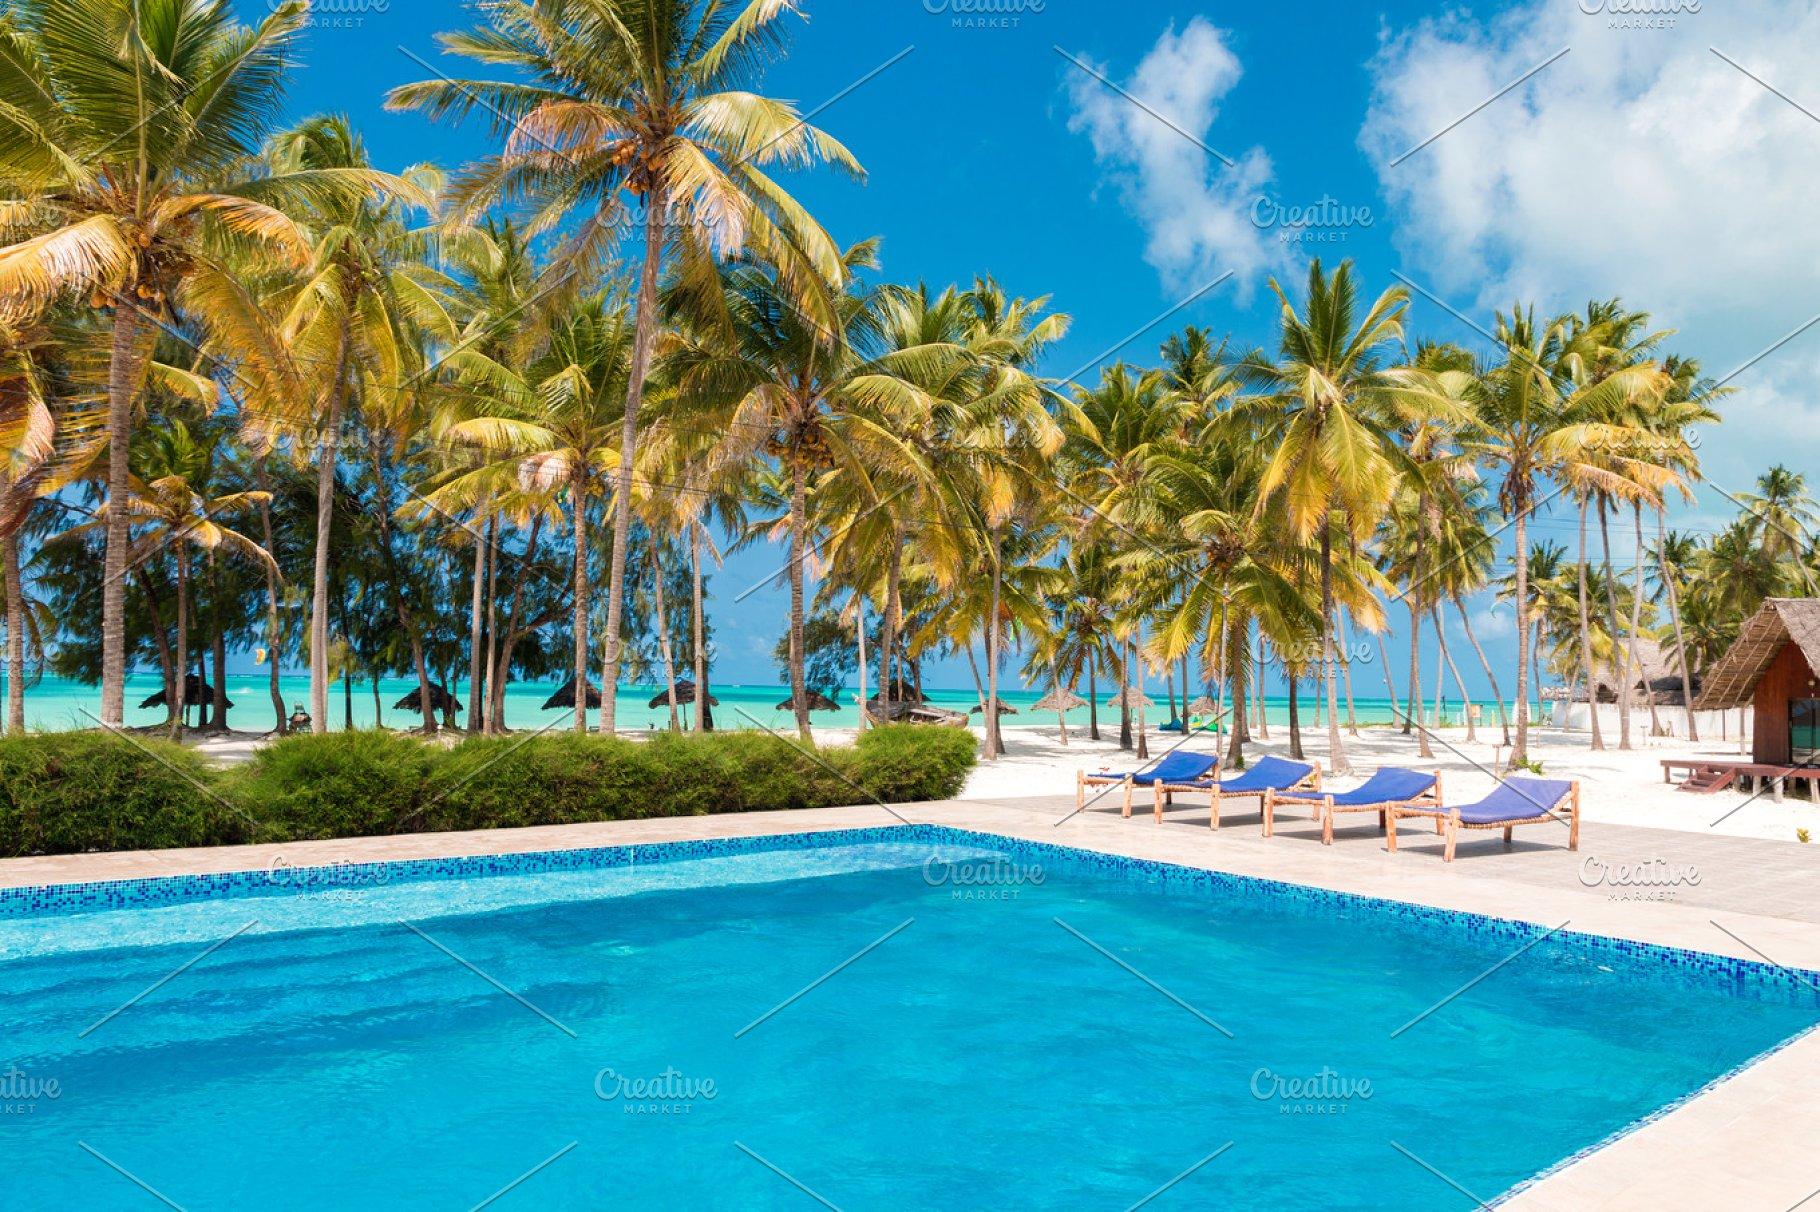 Tropical Swimming Pool ~ Holiday Photos ~ Creative Market